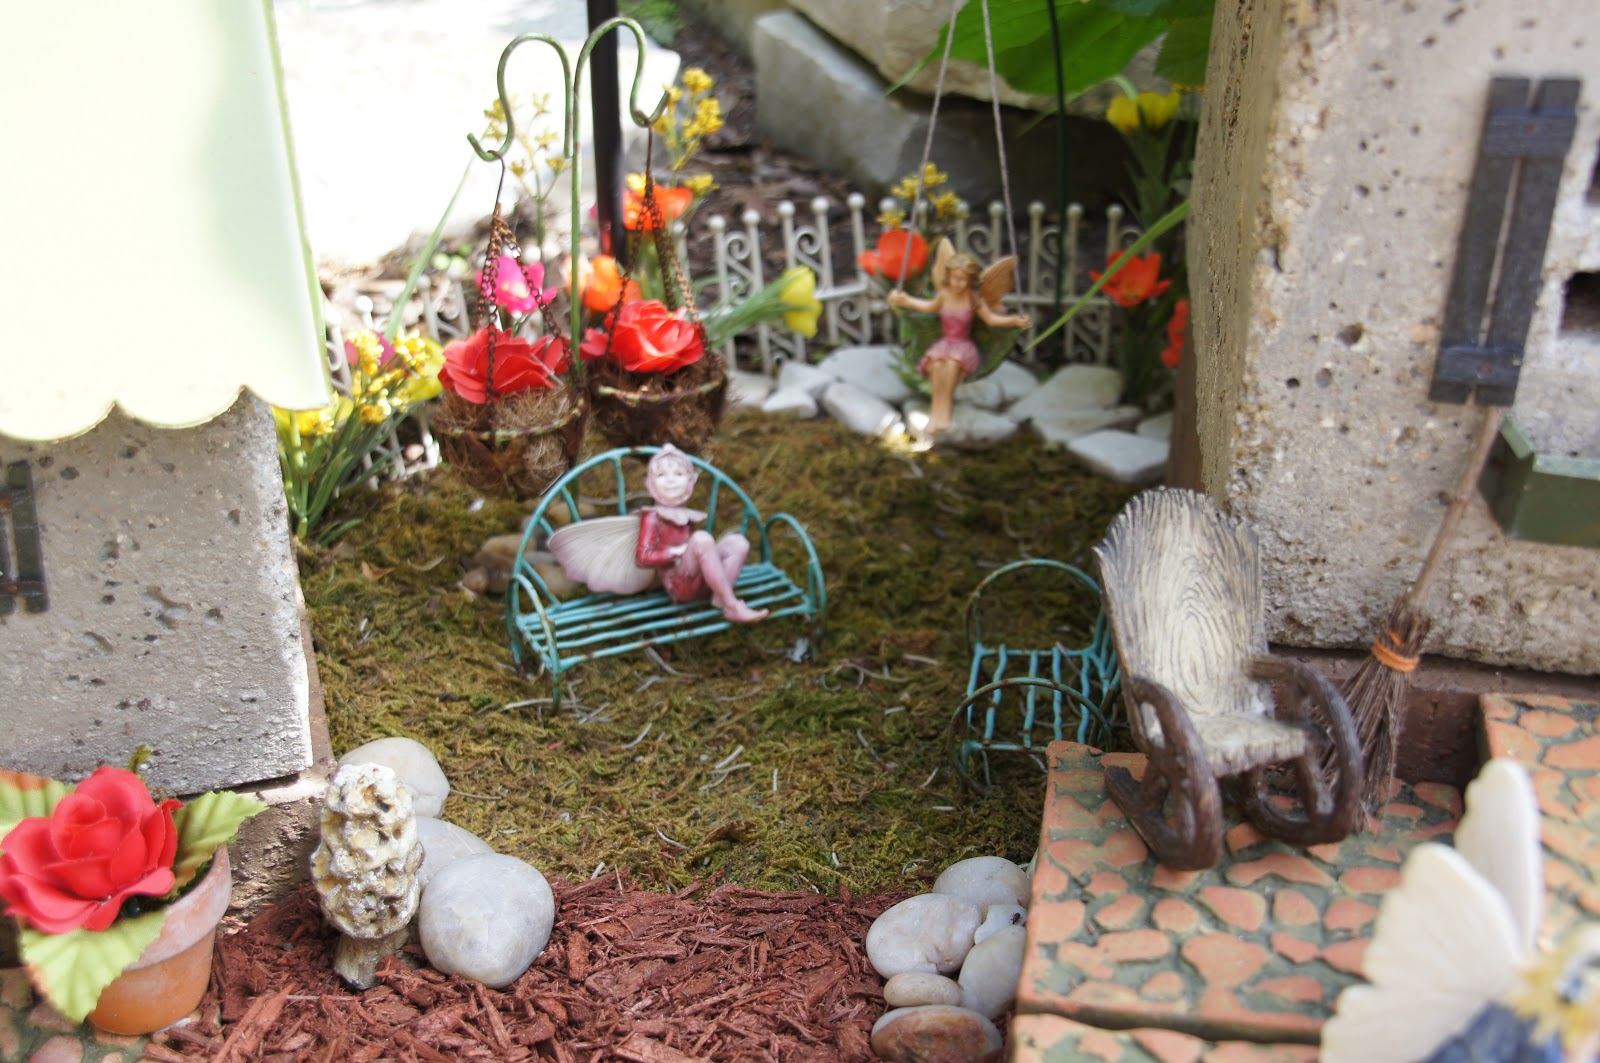 Home and Gardening With Liz: Fantasy Fairy Garden 2018